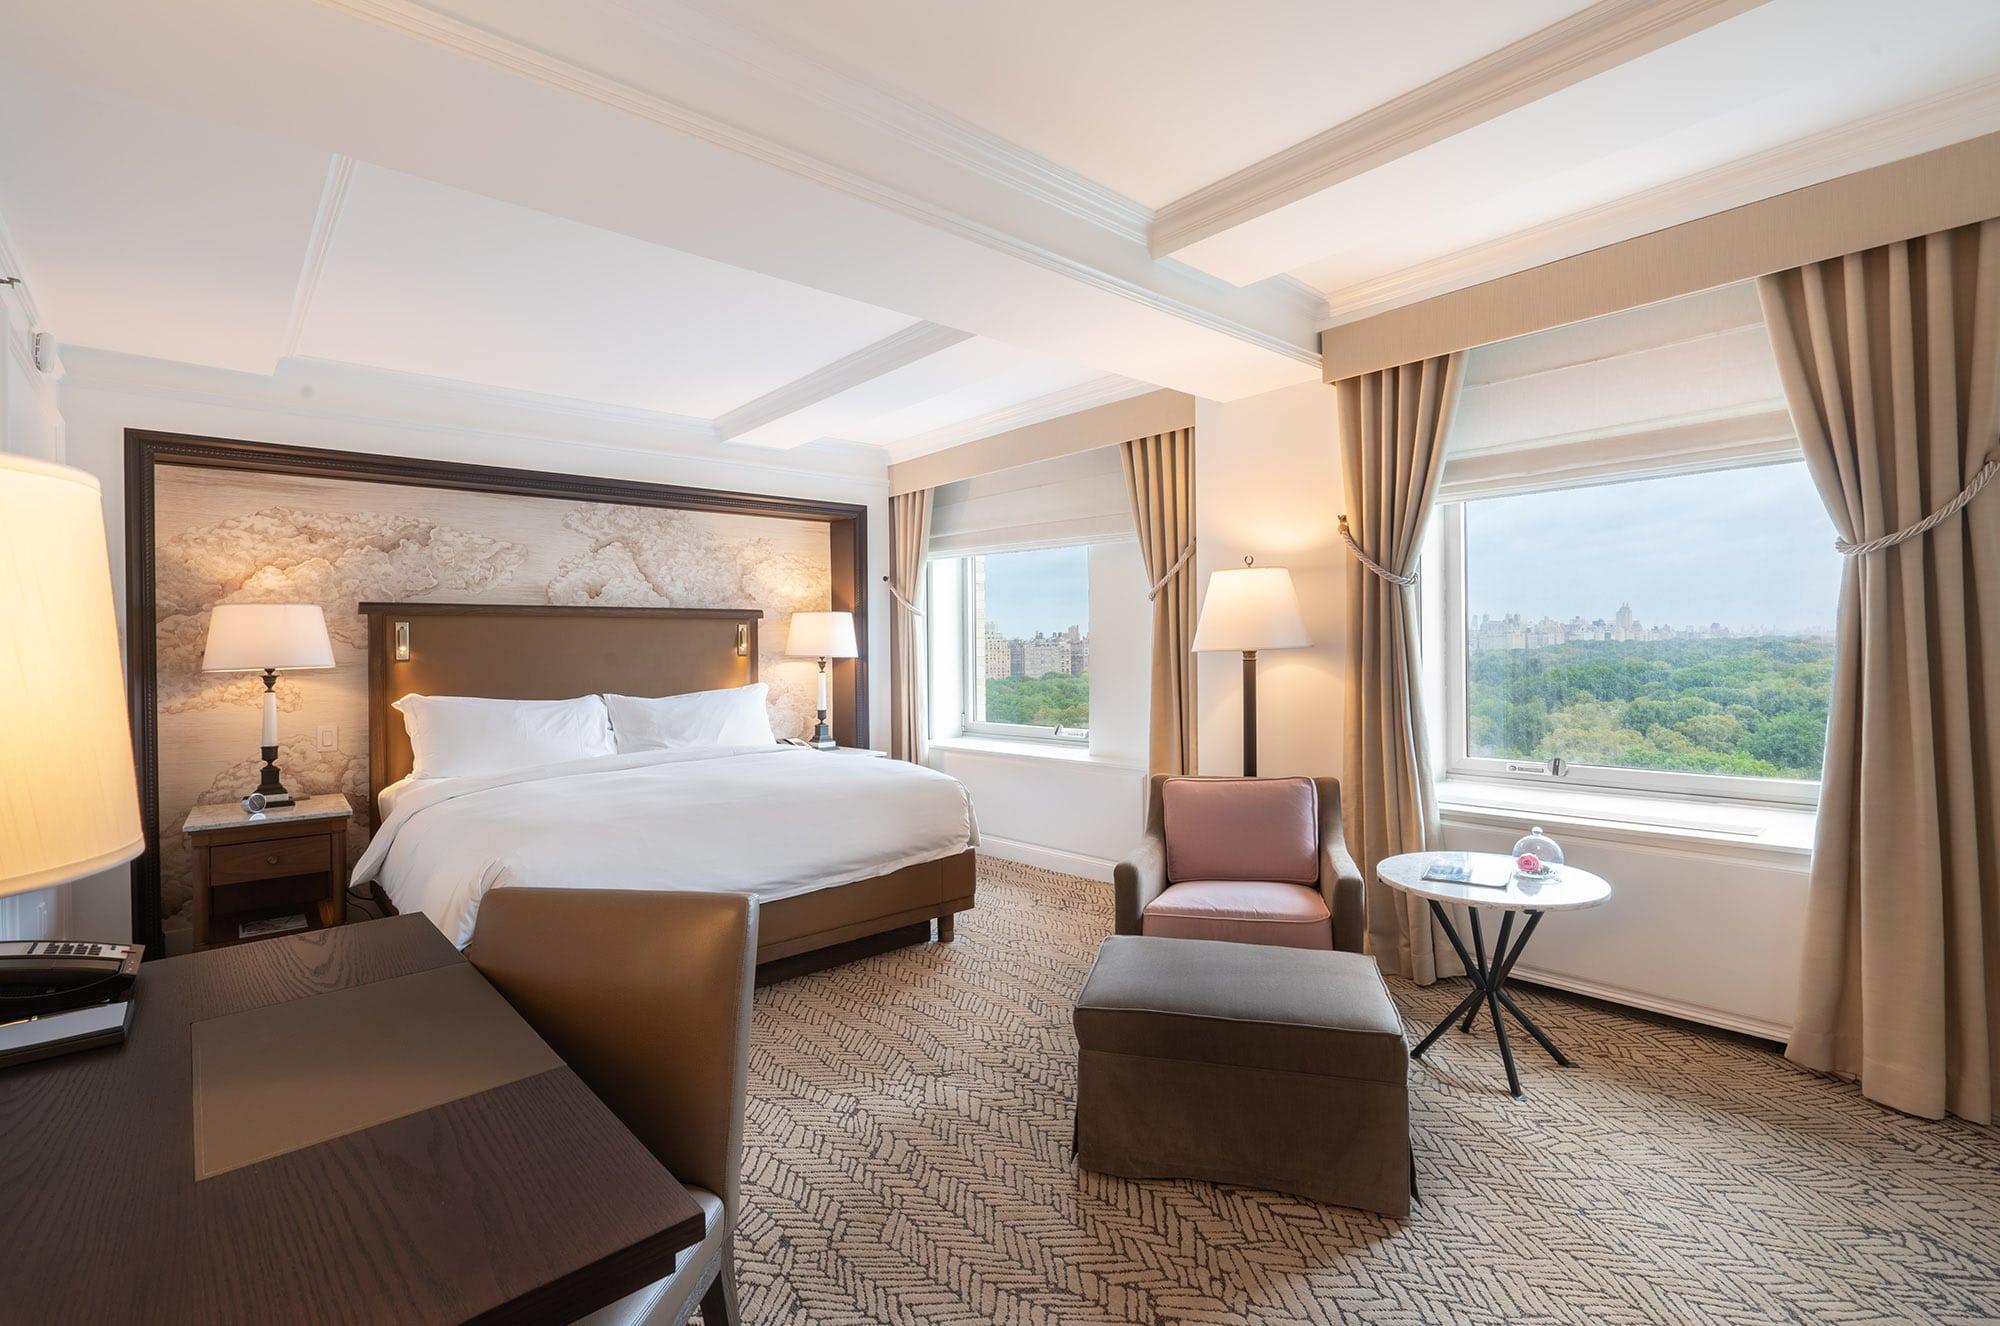 Ritz-Carlton New York Central Park, bedroom